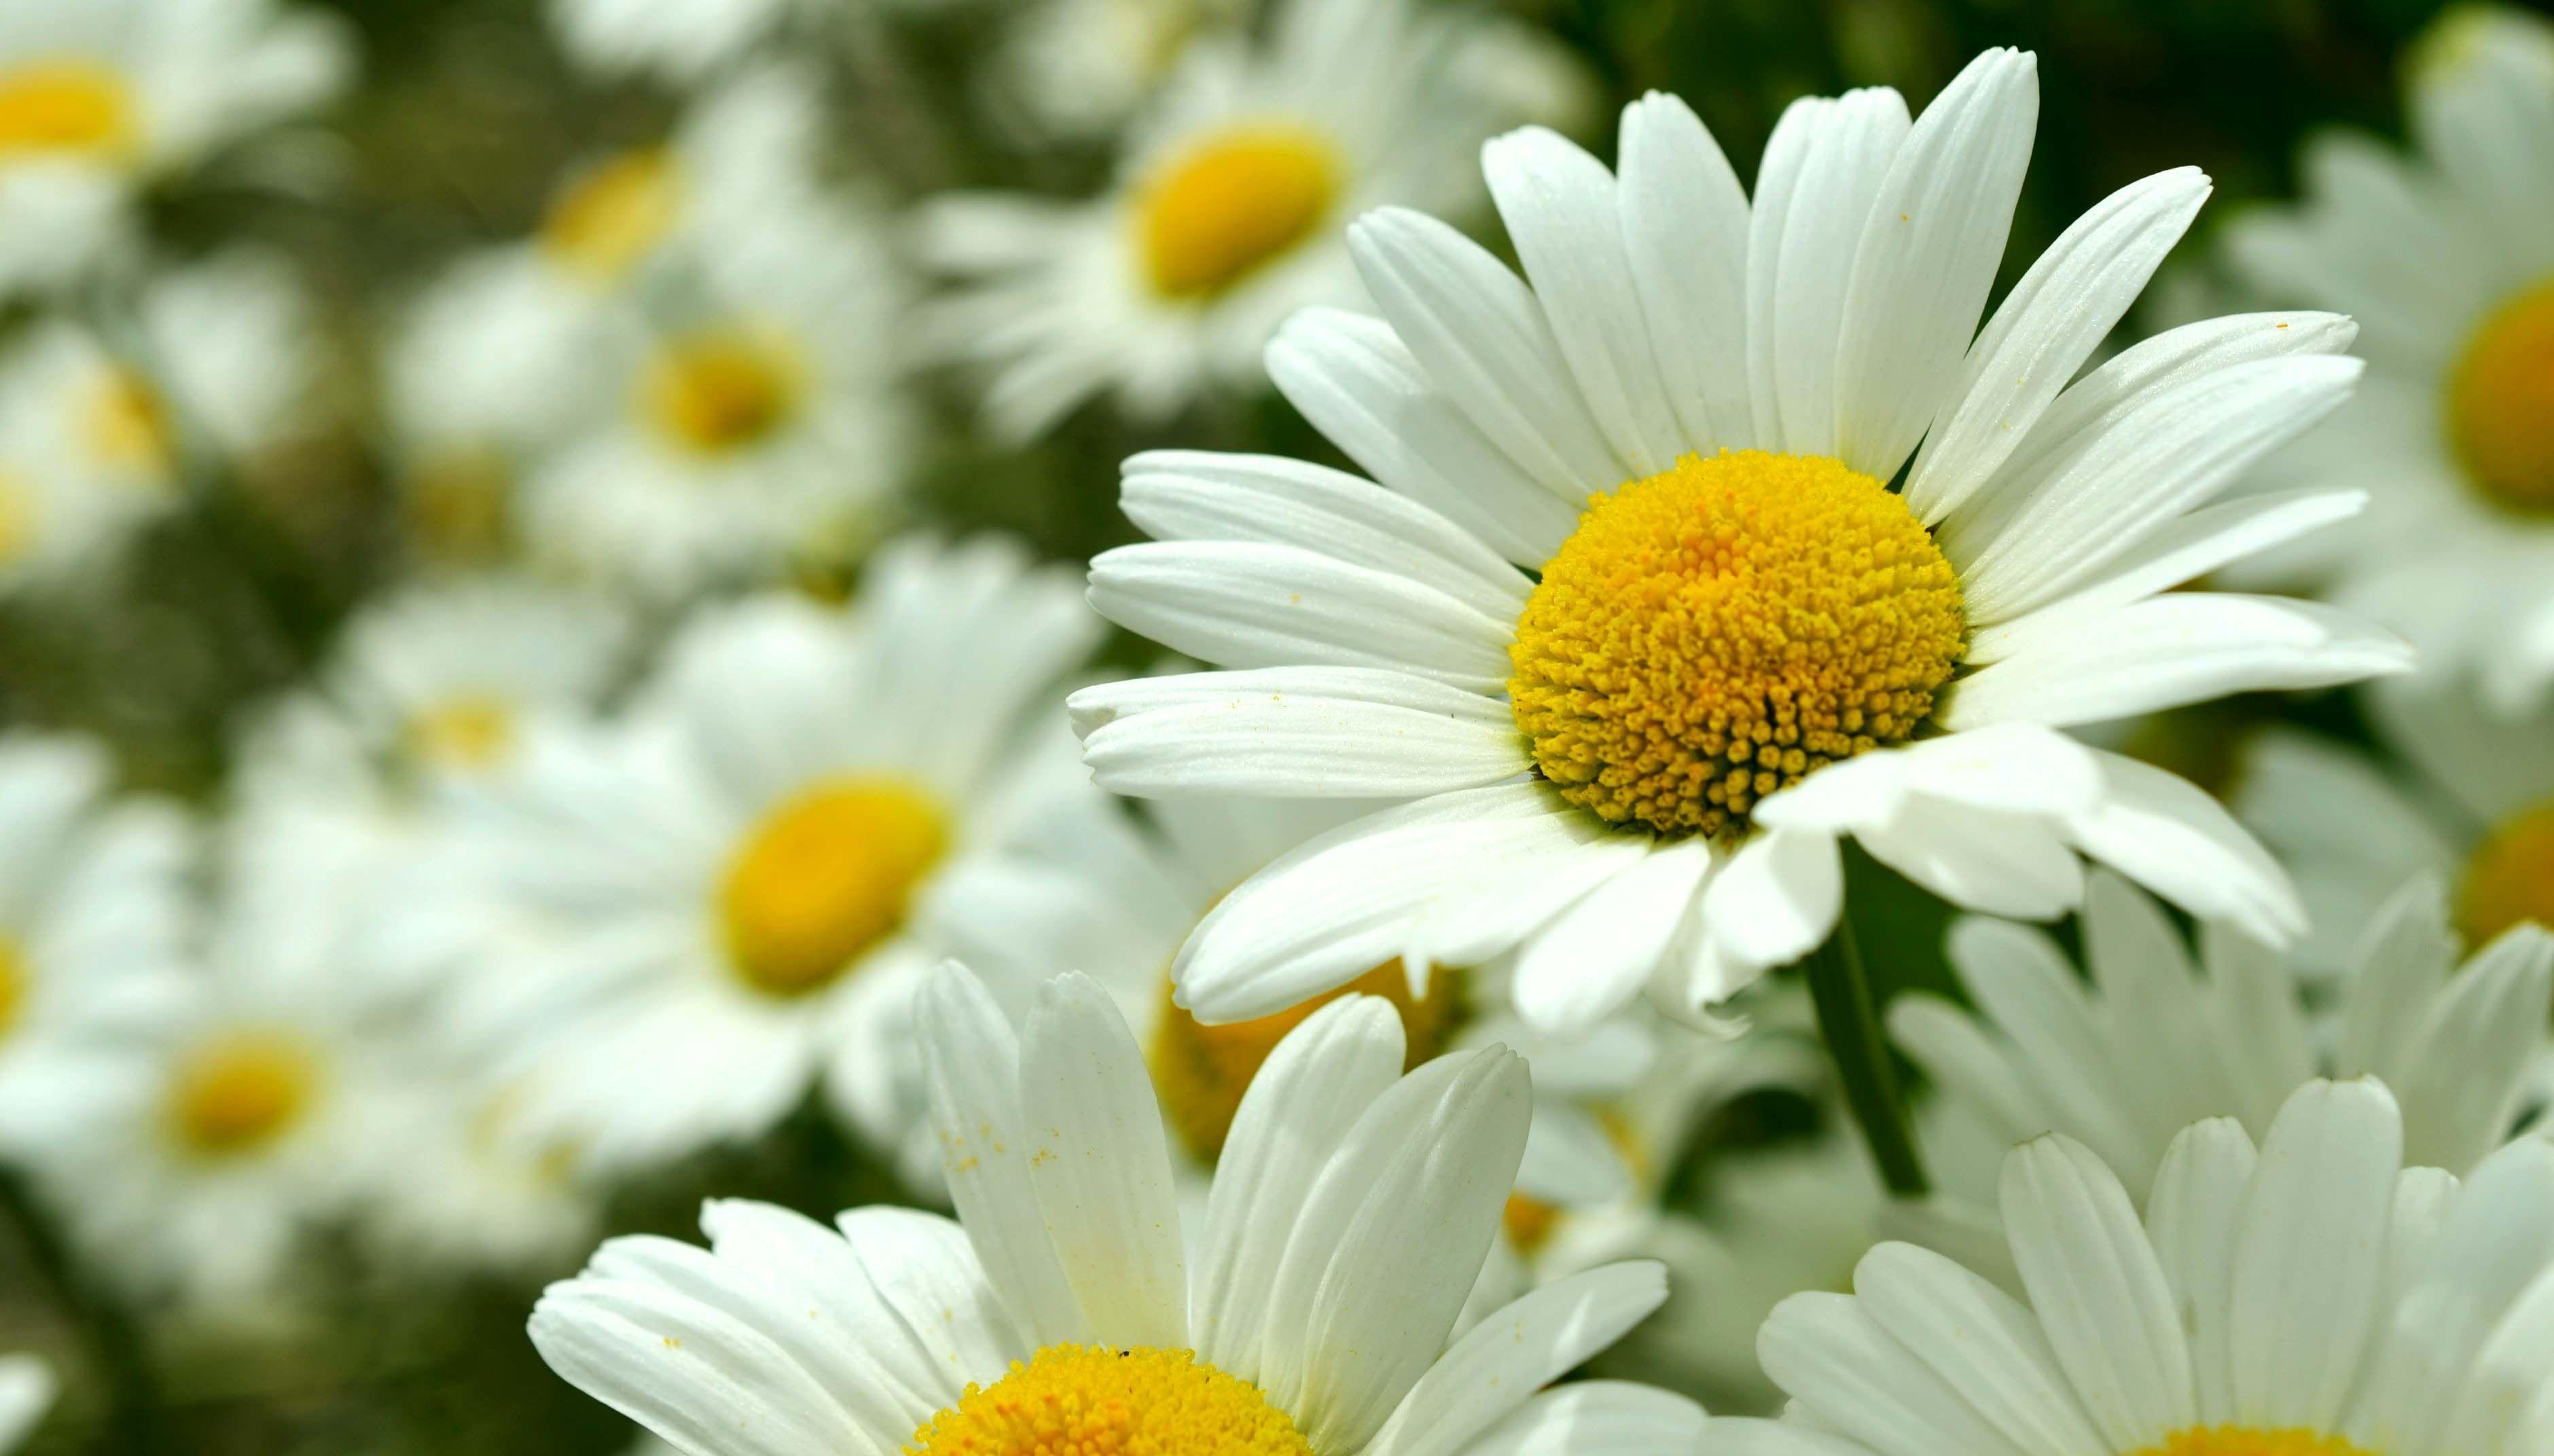 Daisy flower april birth flower tats pinterest april birth daisy flower april birth flower izmirmasajfo